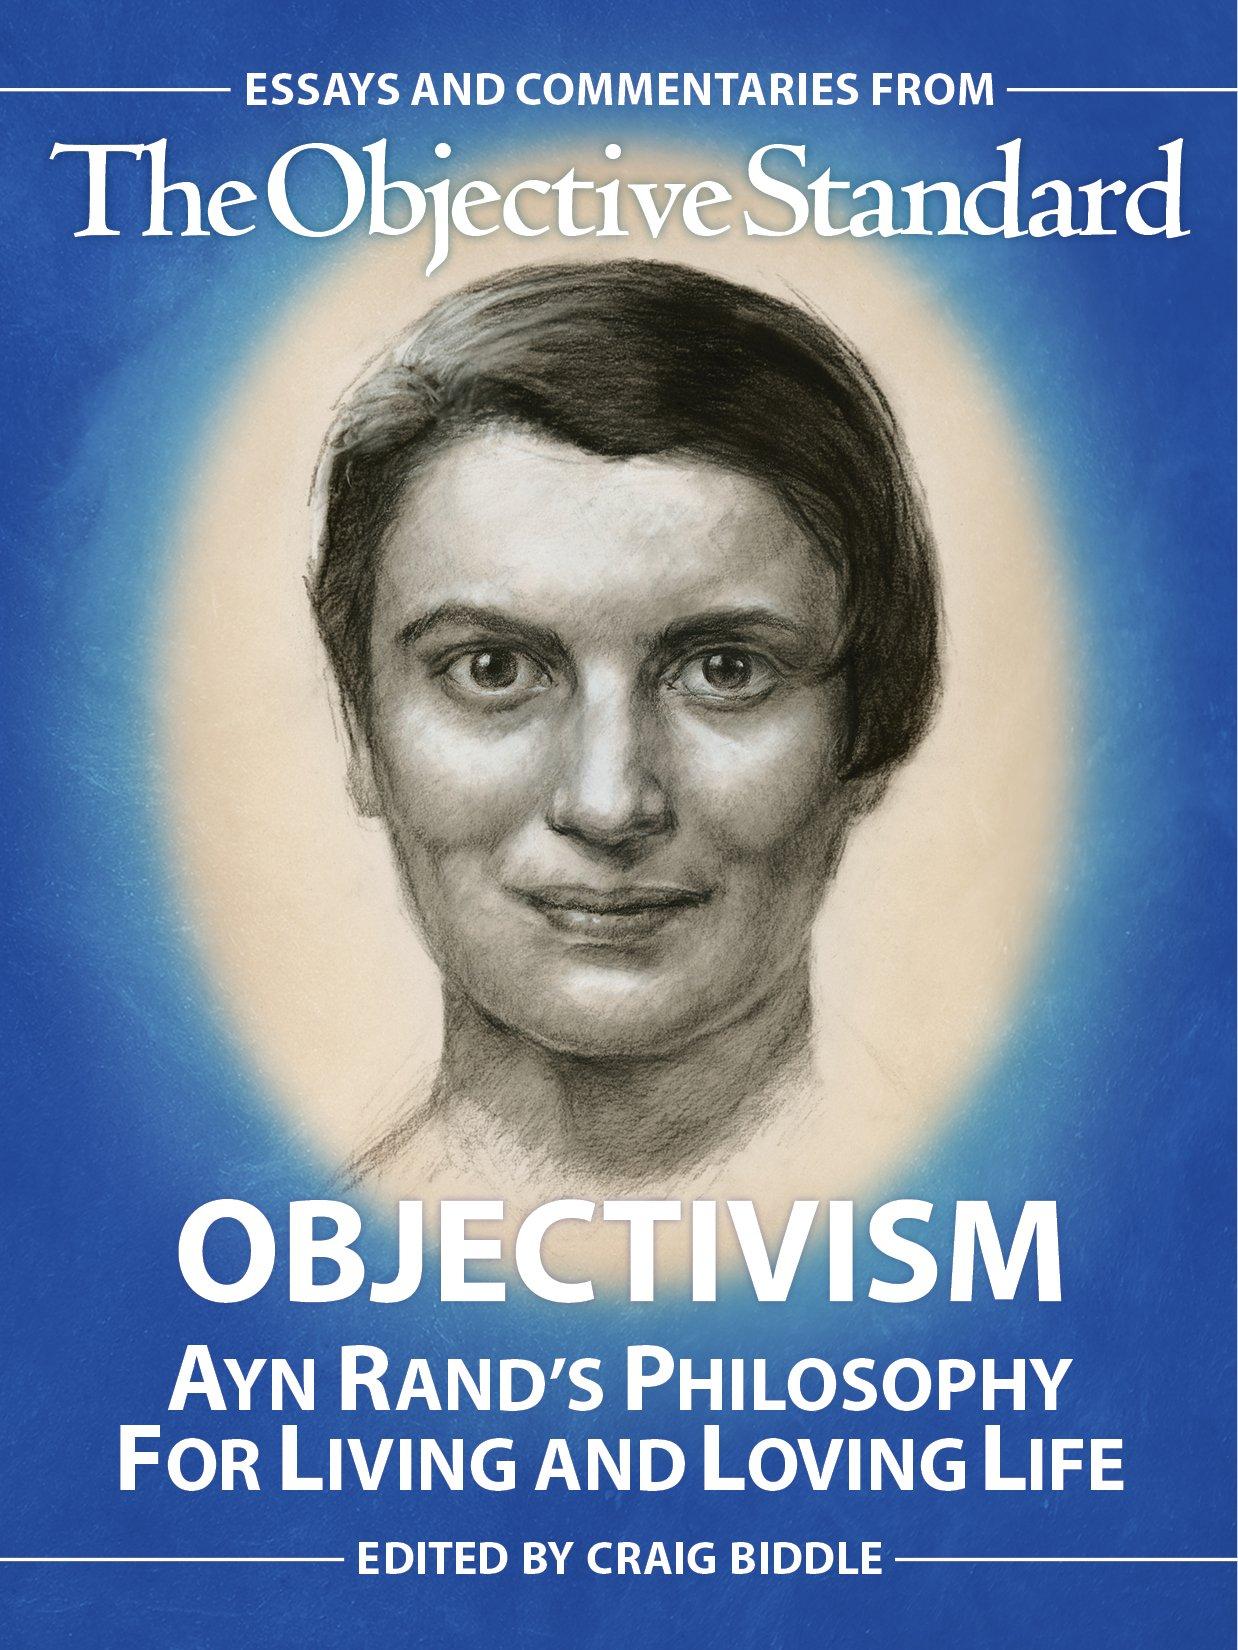 objectivism vs subjectivism